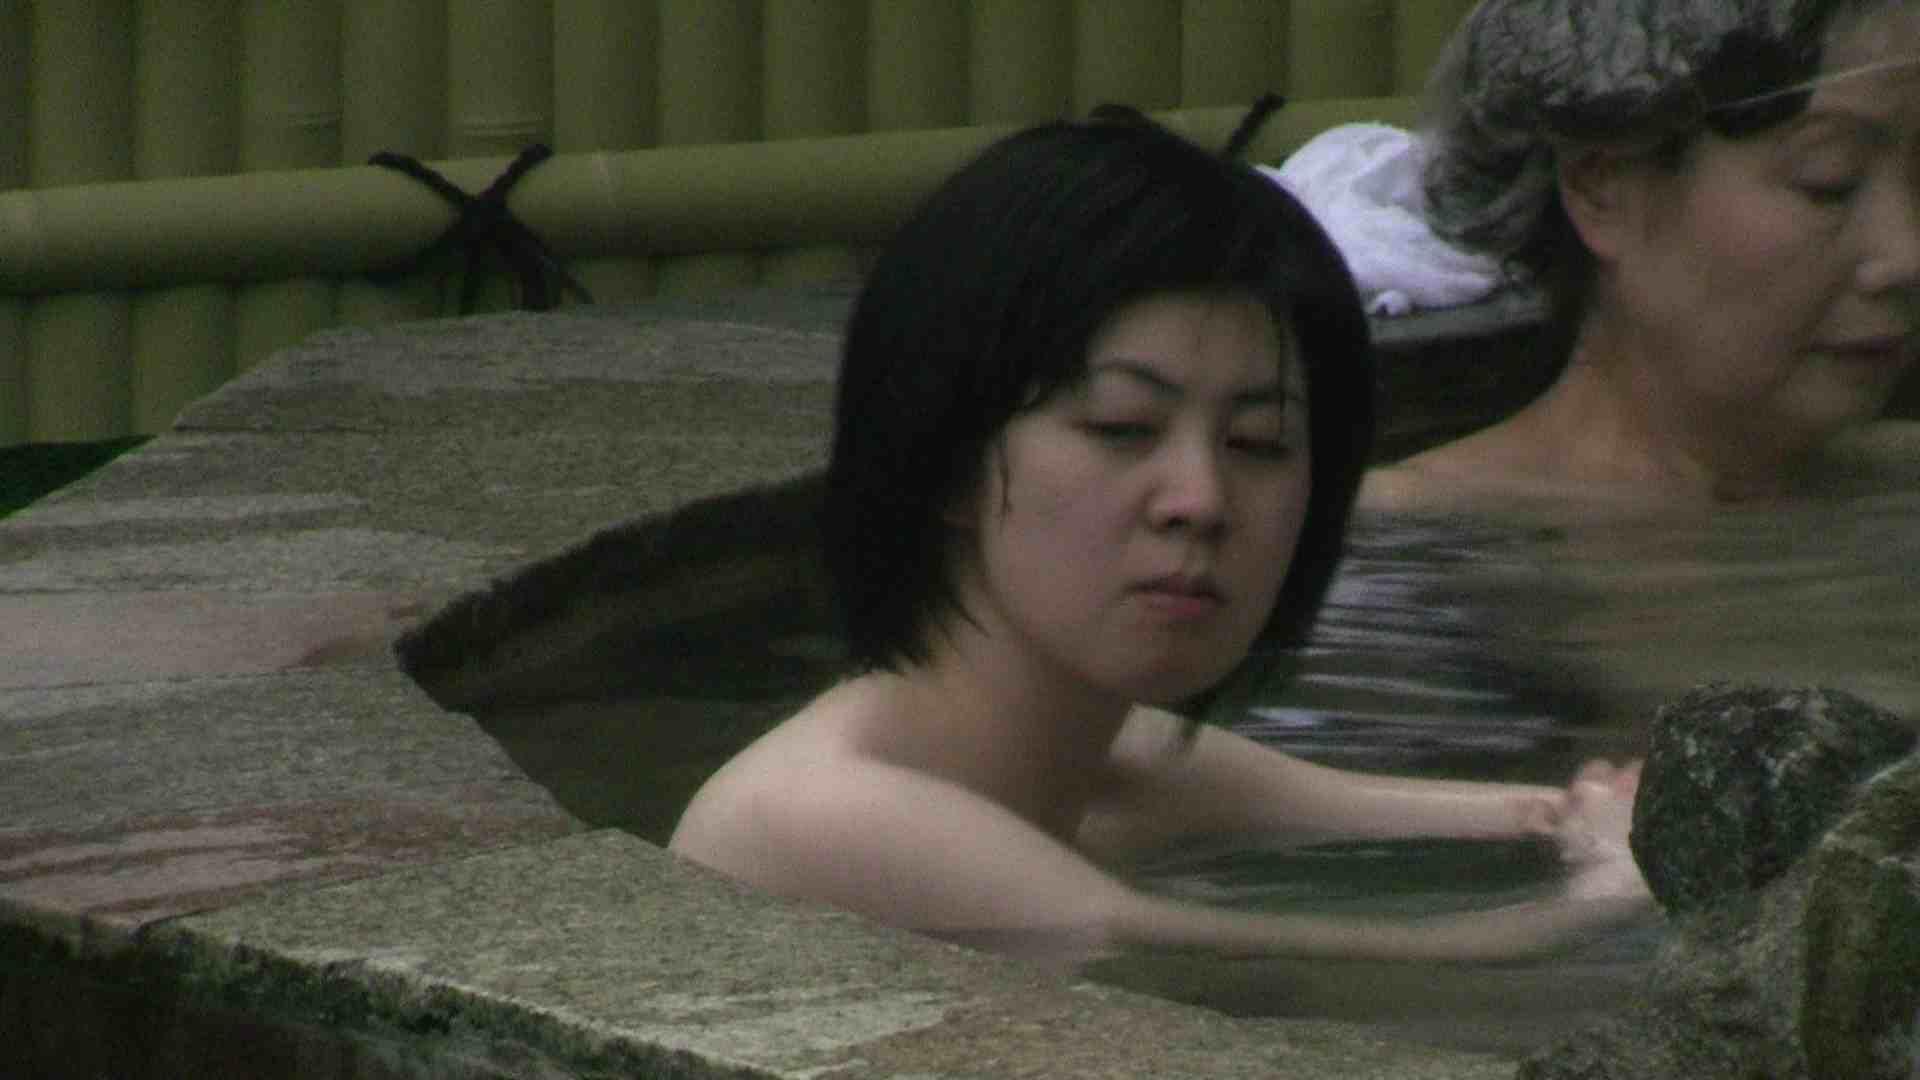 Aquaな露天風呂Vol.685 盗撮シリーズ | 露天風呂編  95PIX 89